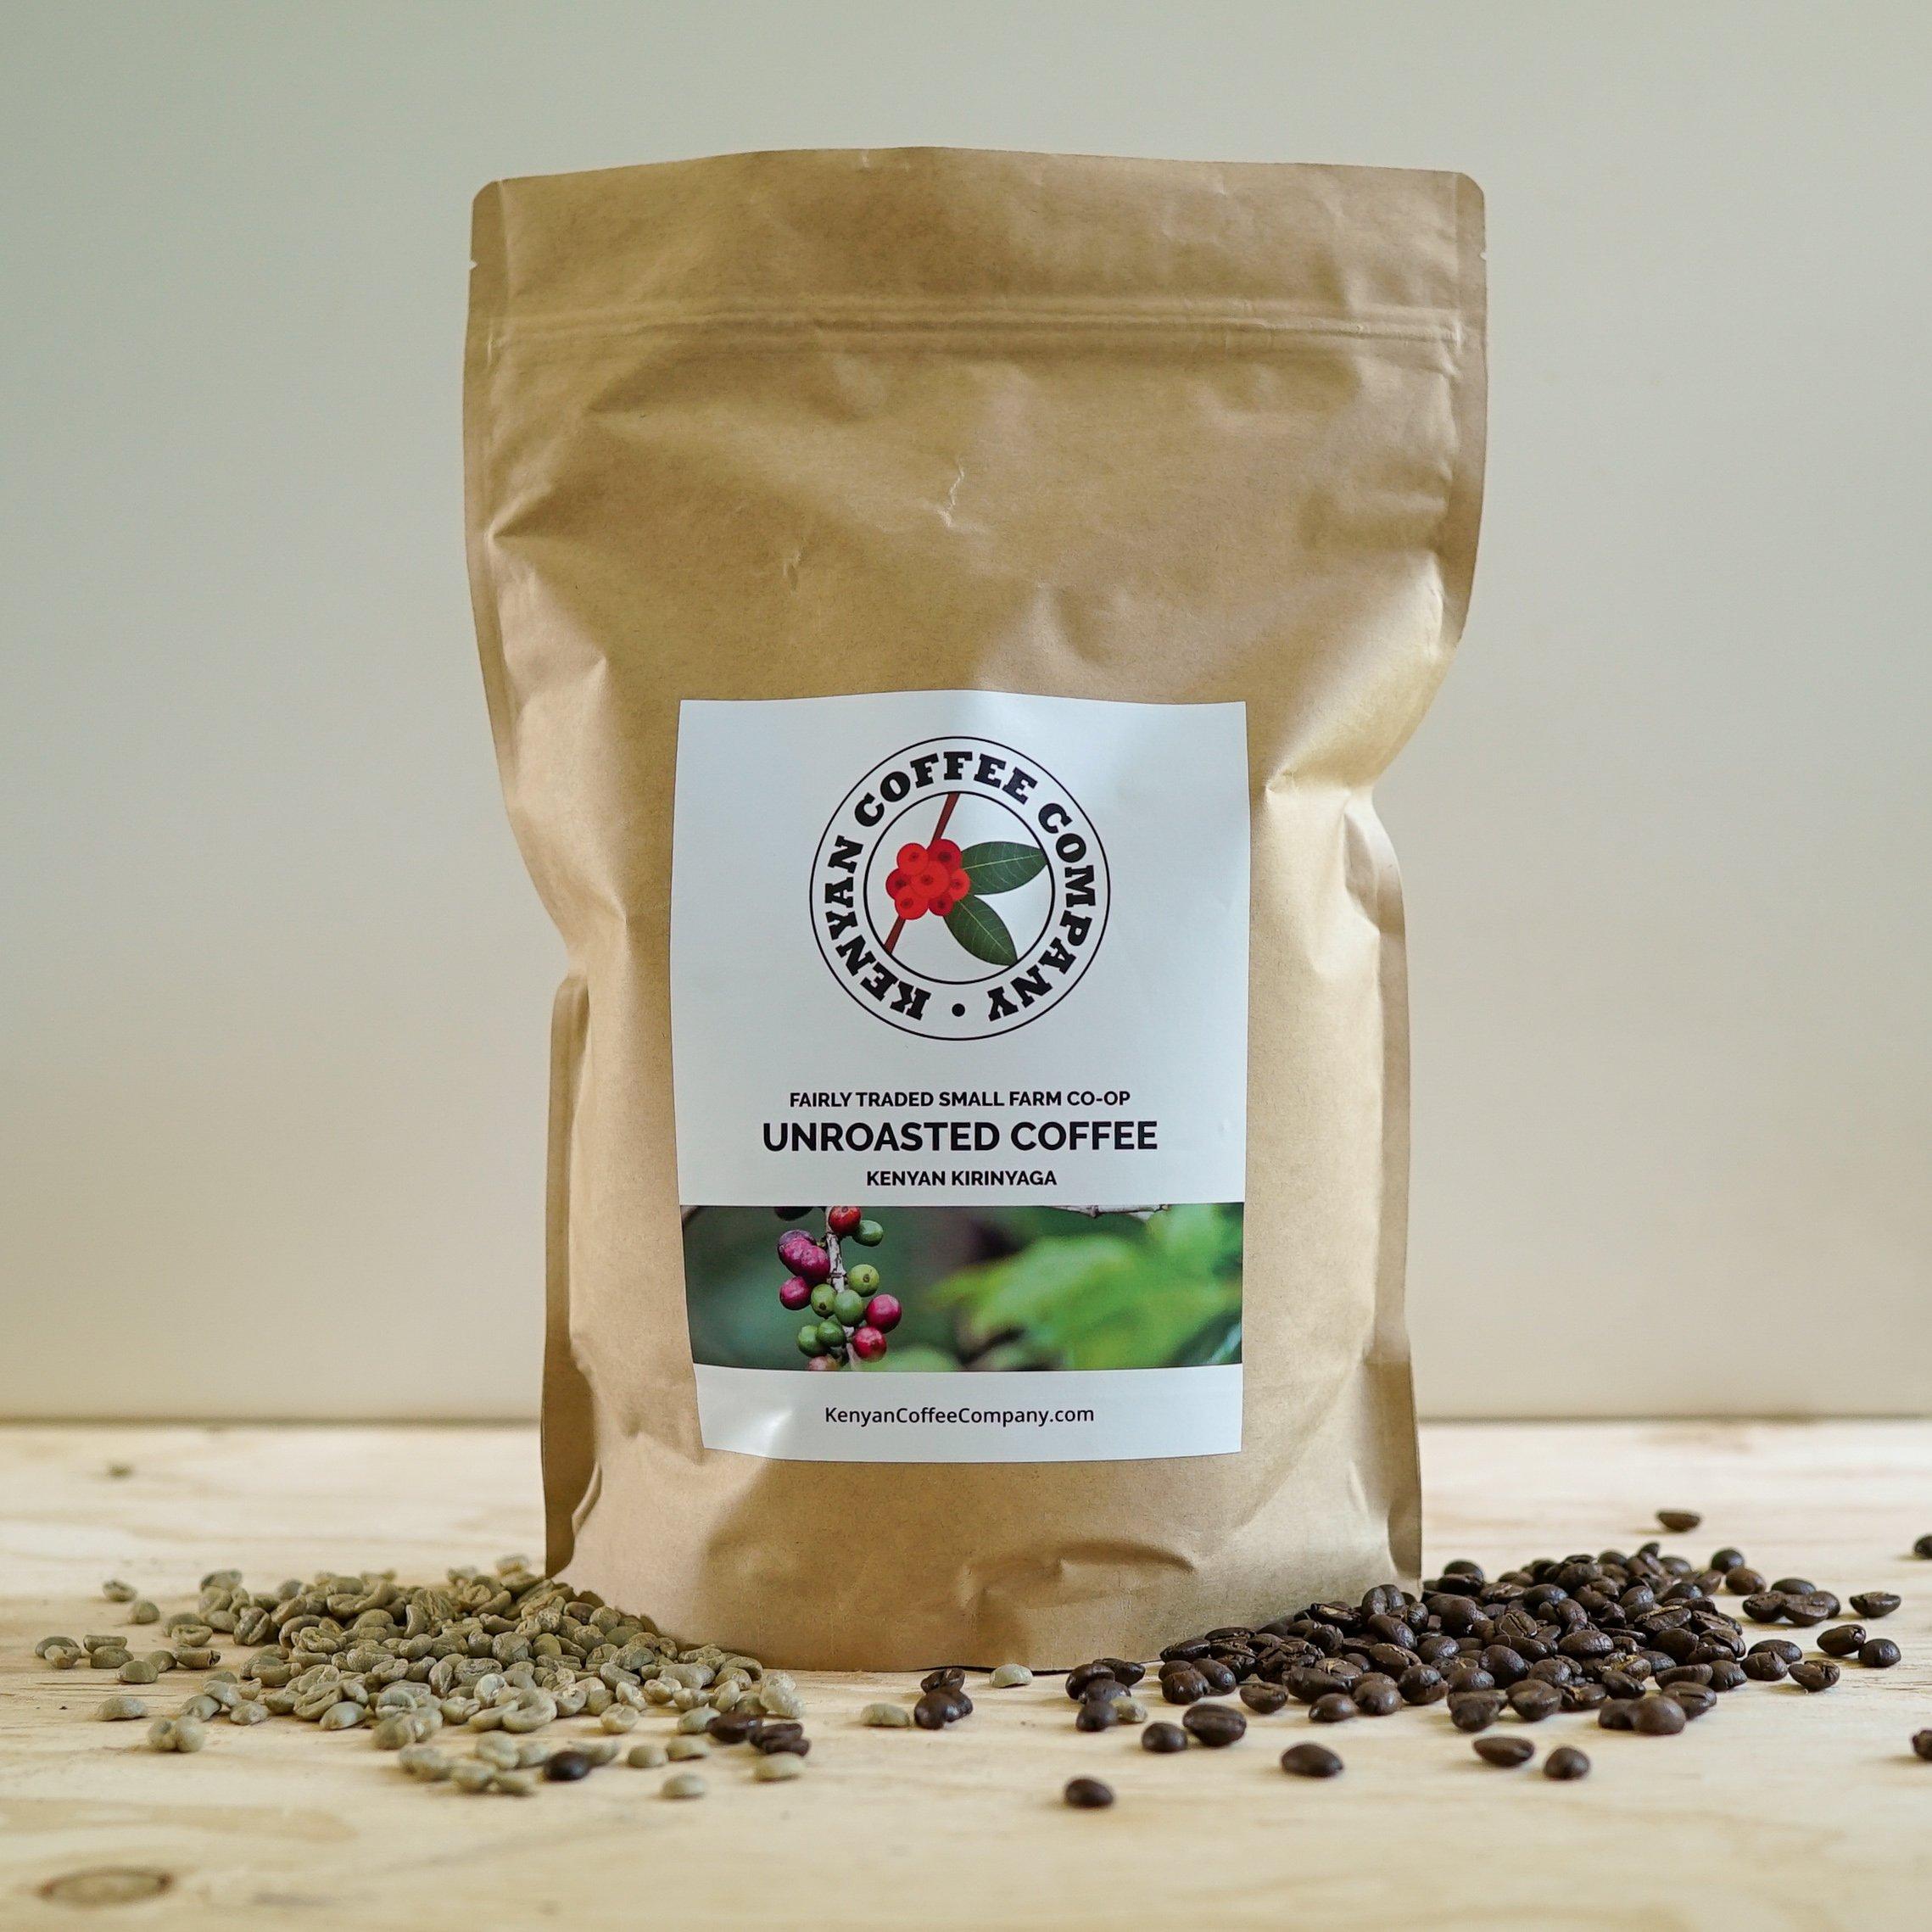 Single Origin Unroasted Green Coffee Beans, AA Grade From Small Regional Kenyan Coffee Farmer Co-Op. Direct Trade (3 pounds) by Kenyan Coffee Company